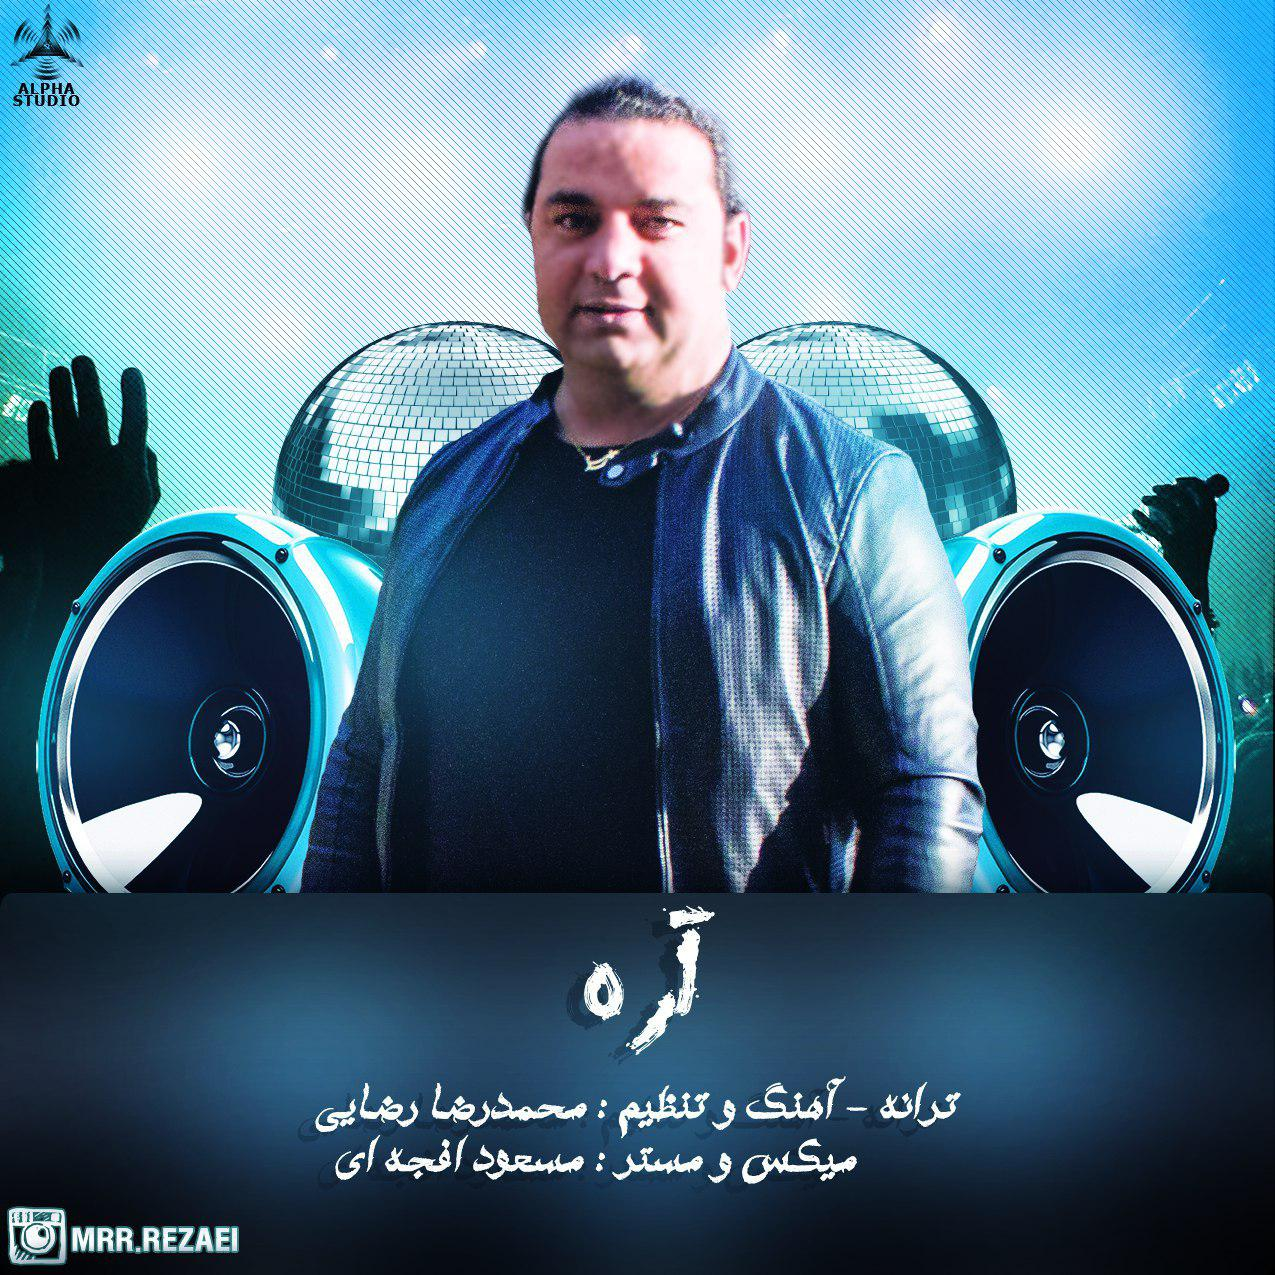 Mohammadreza Rezaei – Are